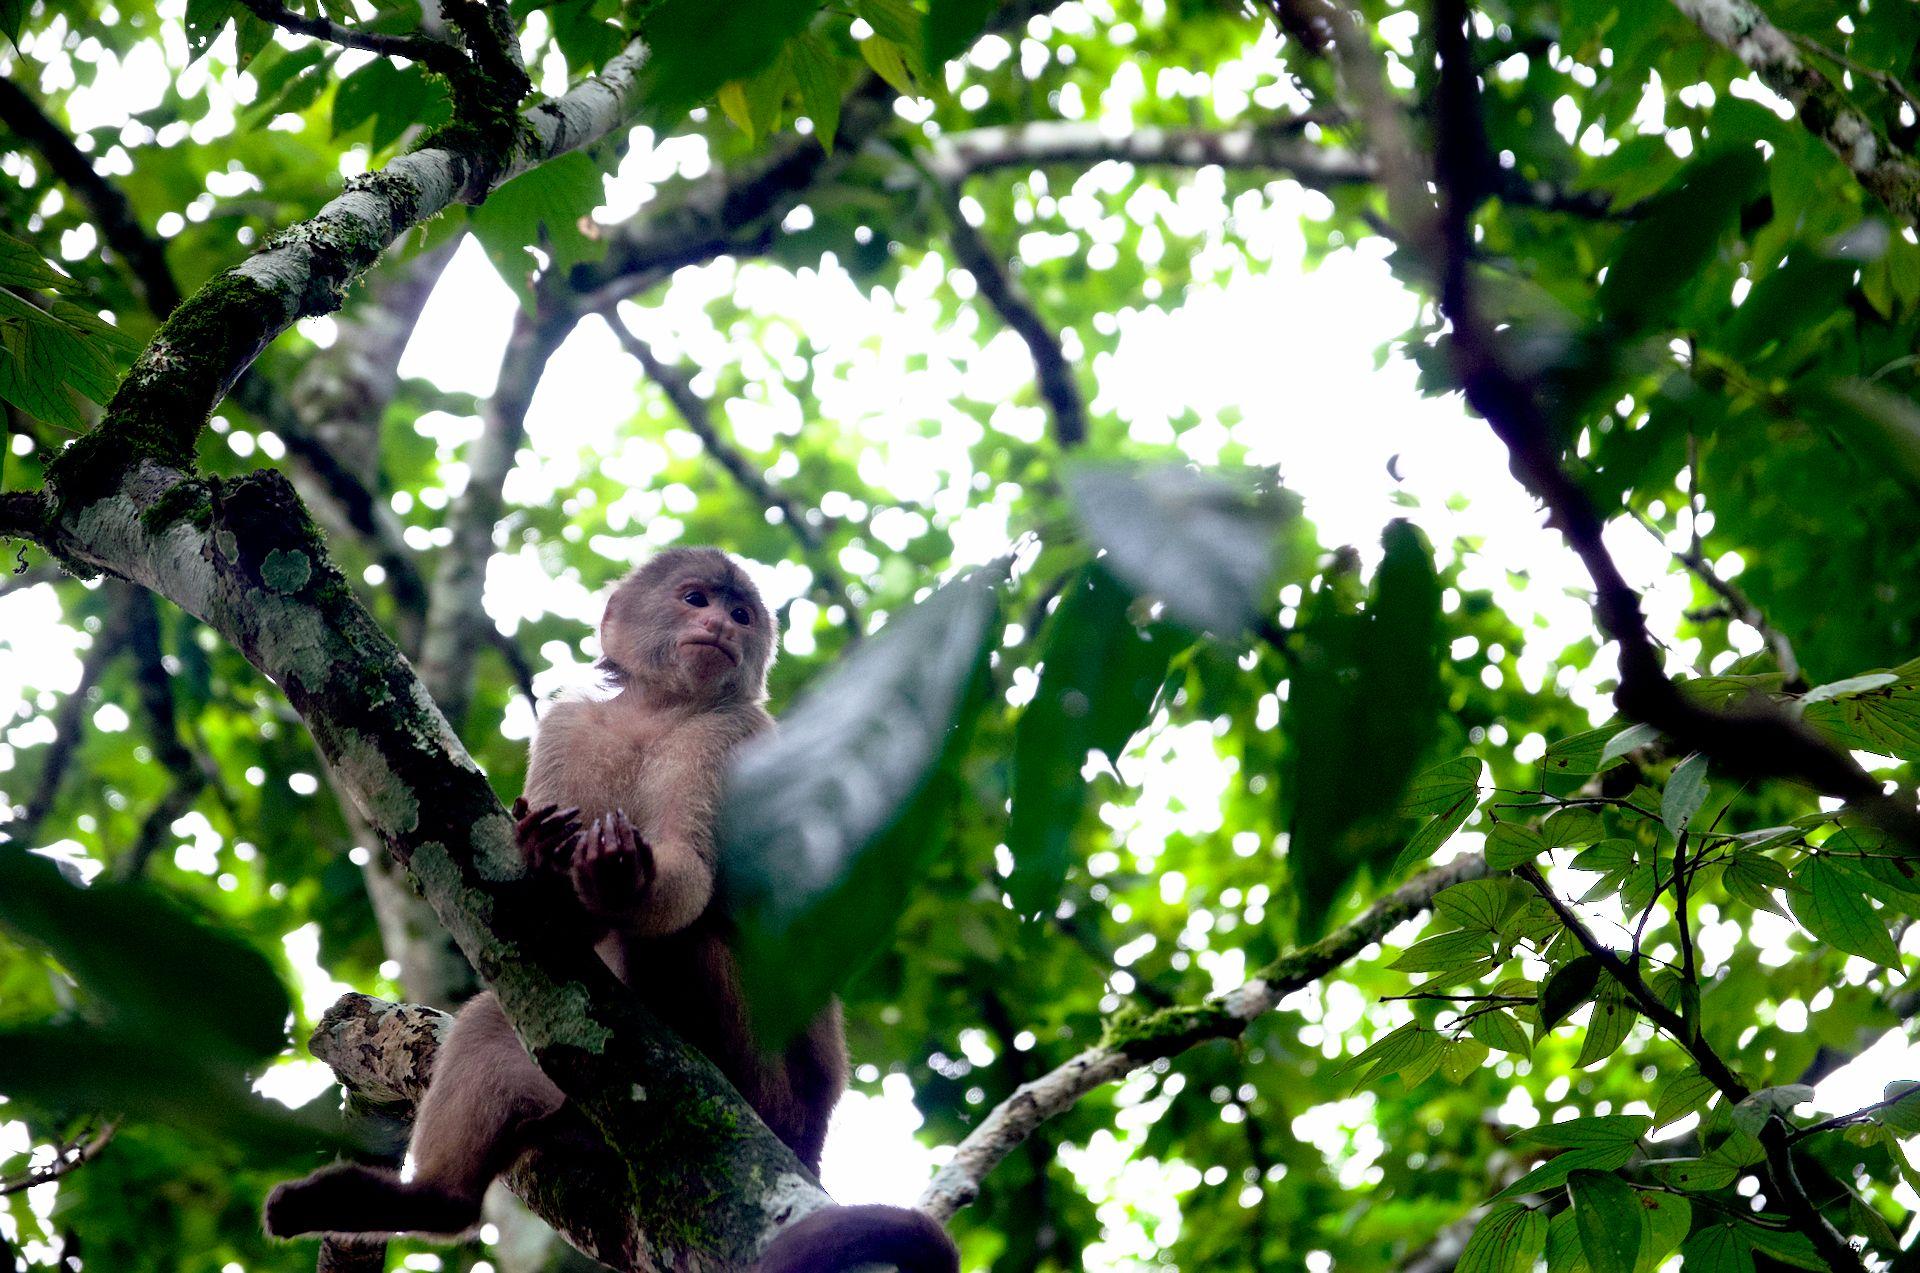 In Tena im Dschungel